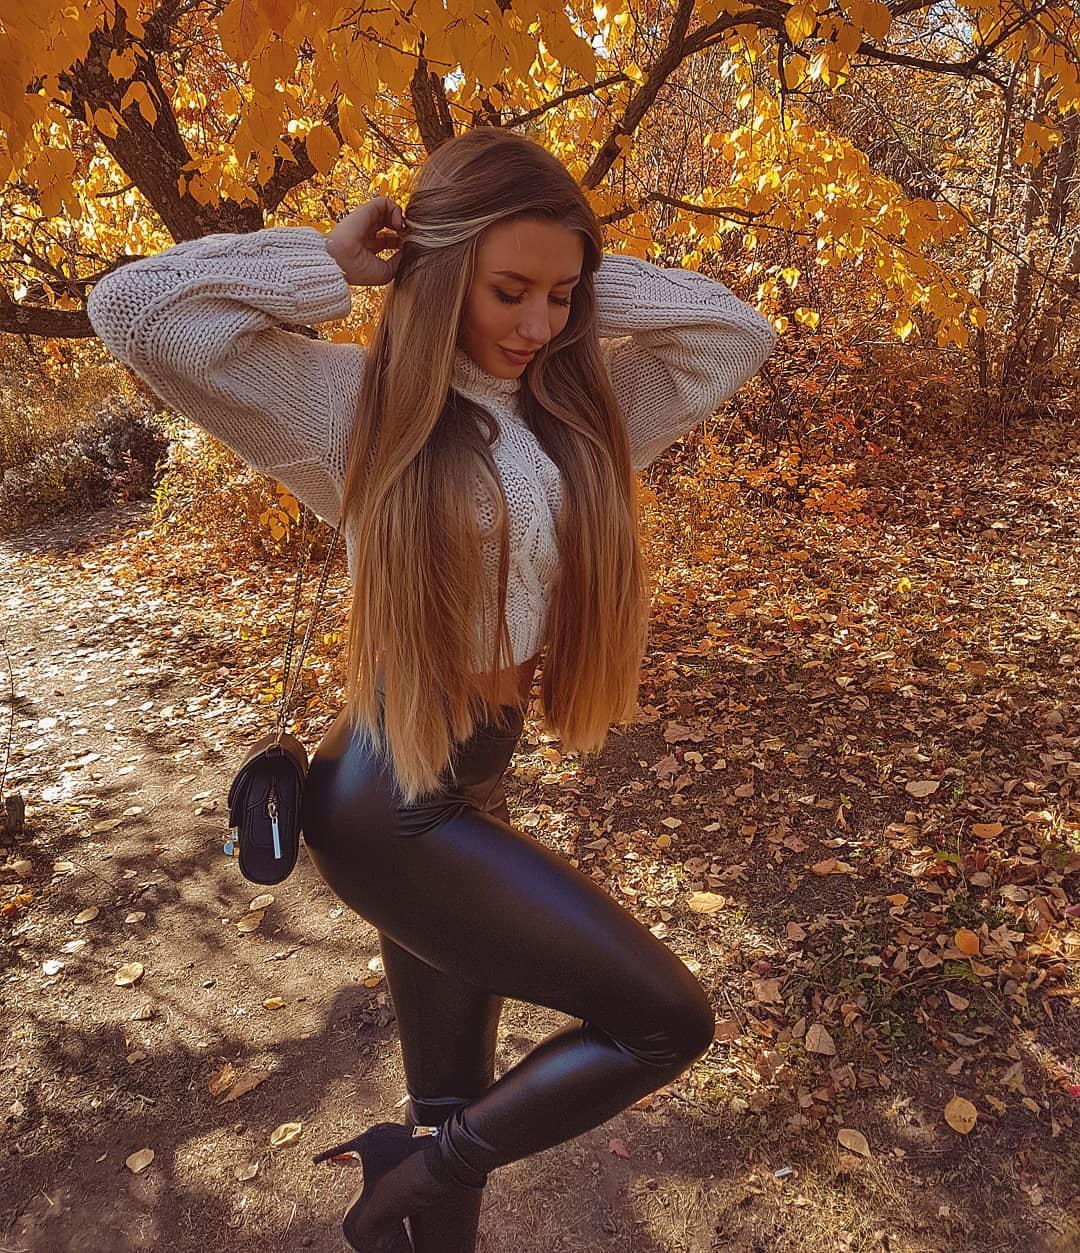 Alina-Cherepanova-Wallpapers-Insta-Fit-Bio-10